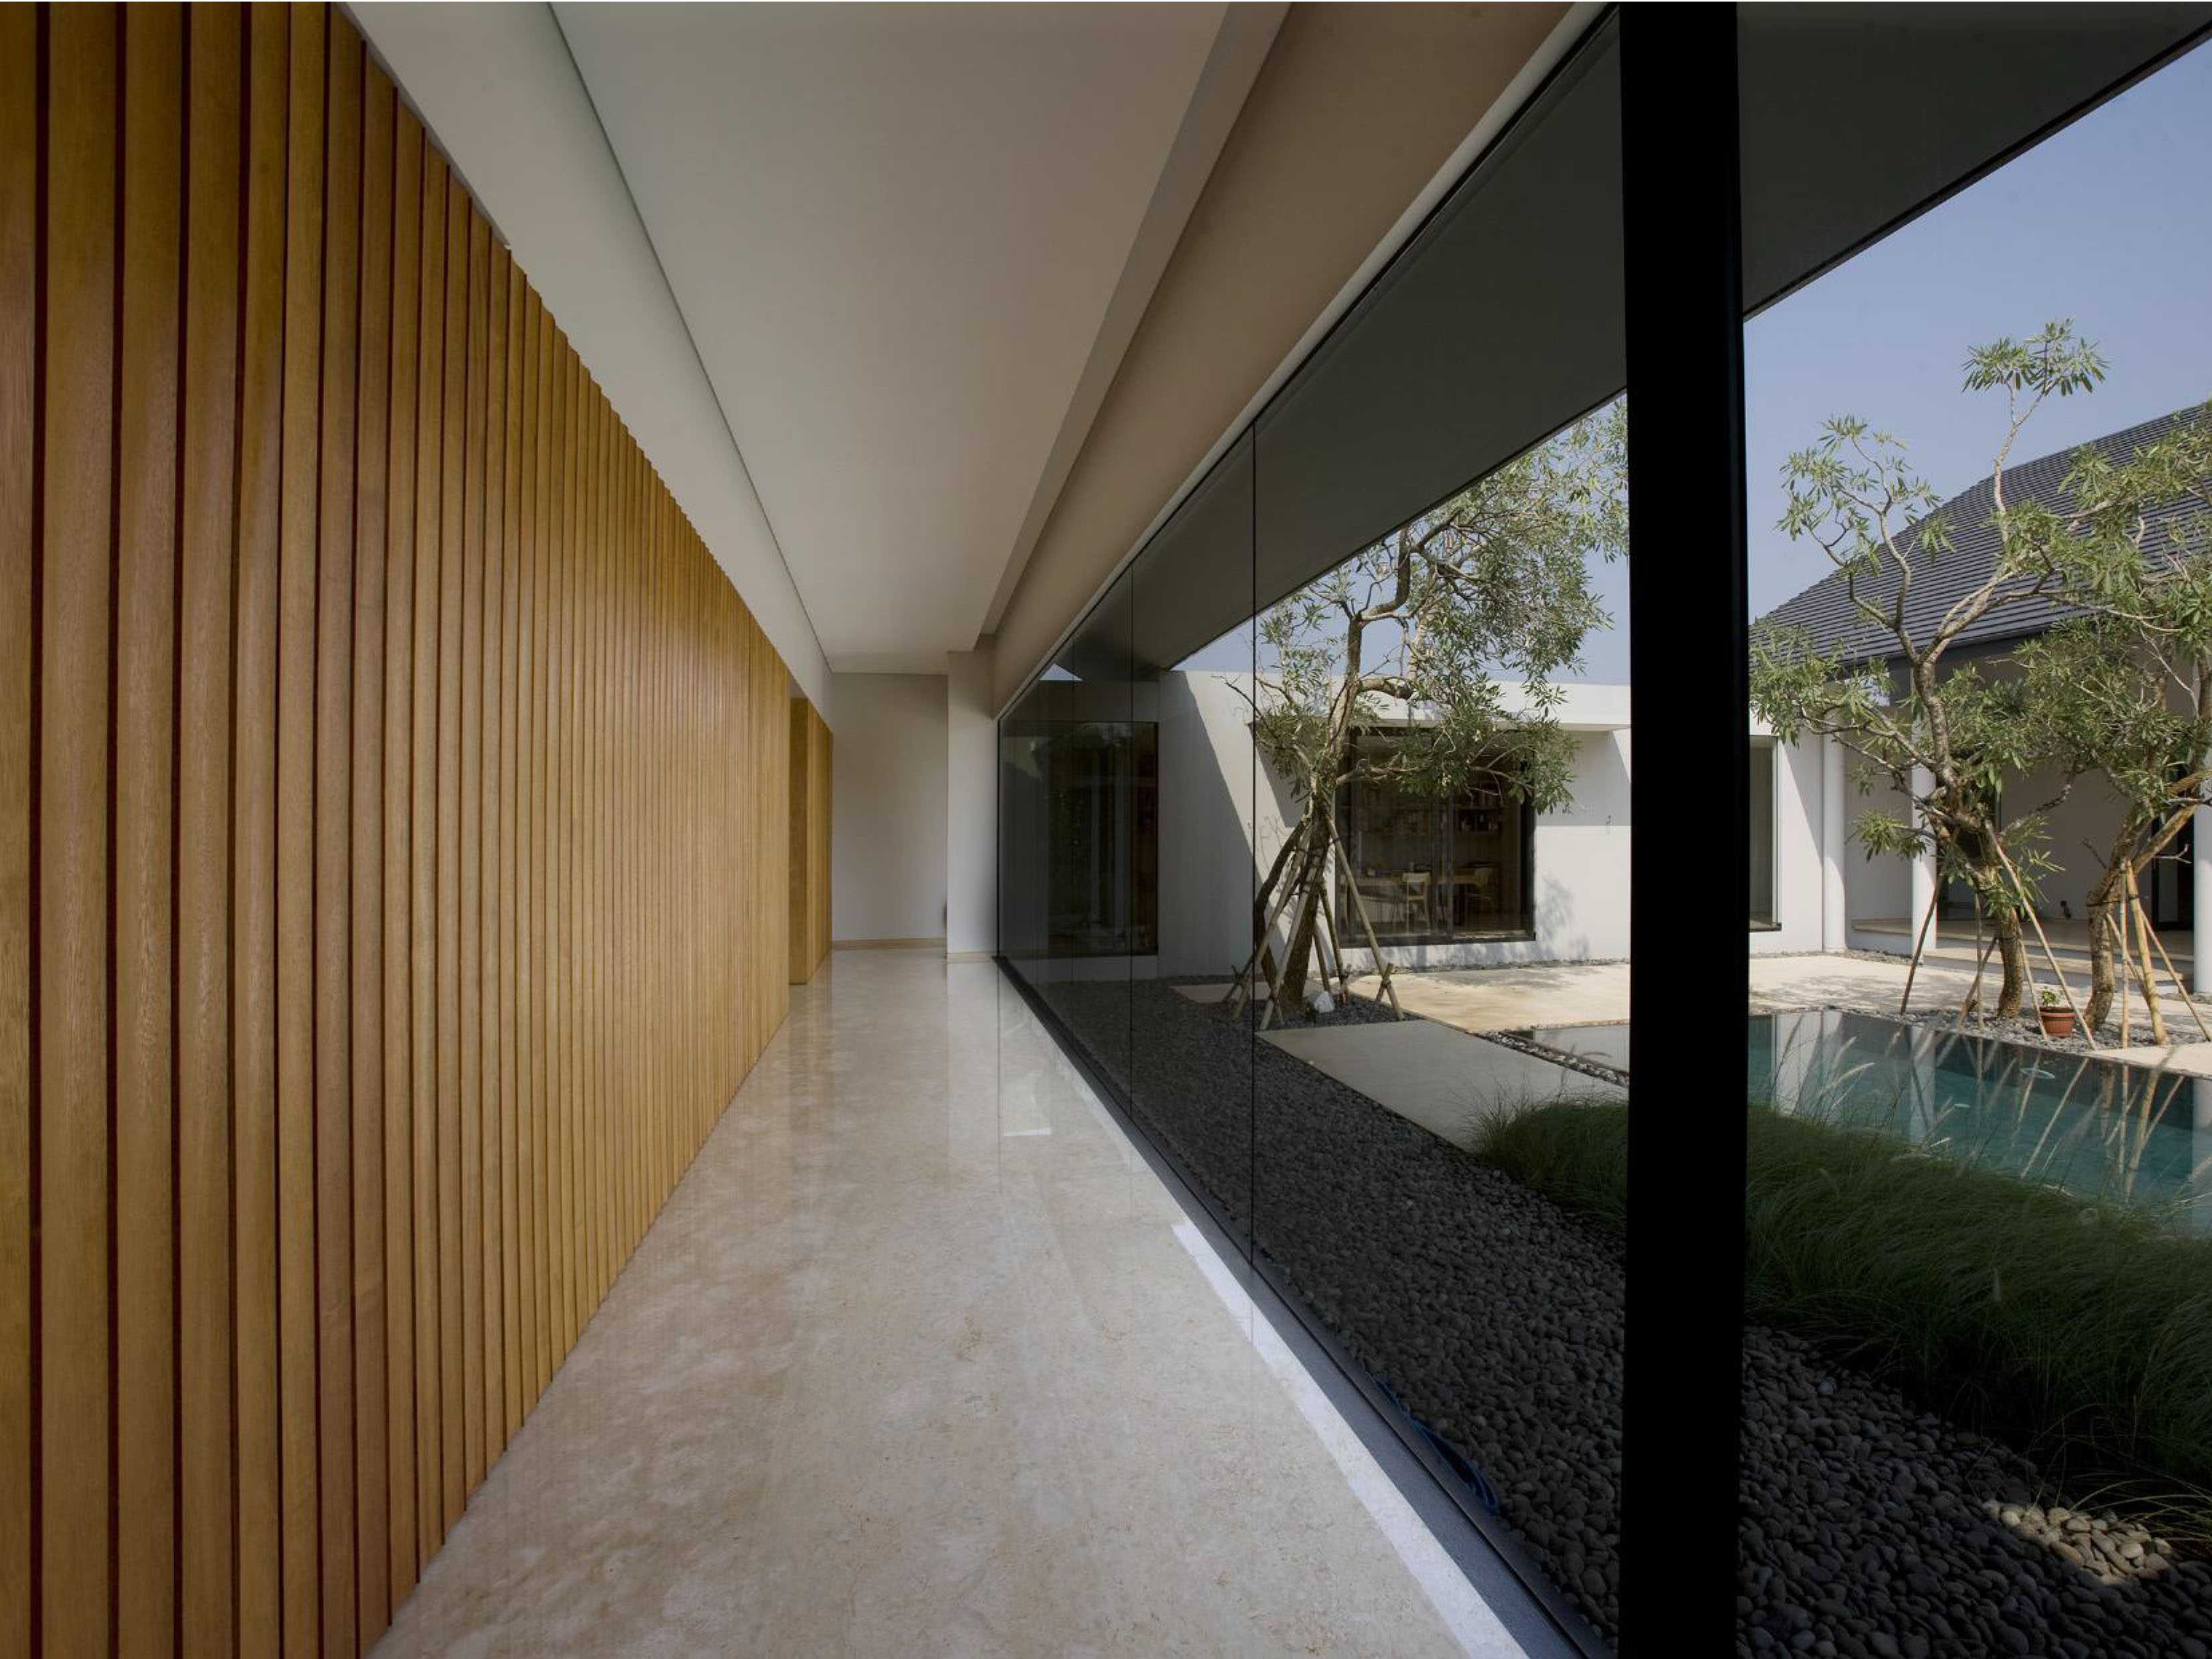 Studio Air Putih P_House Bsd, Serpong Bsd, Serpong Corridor   25073